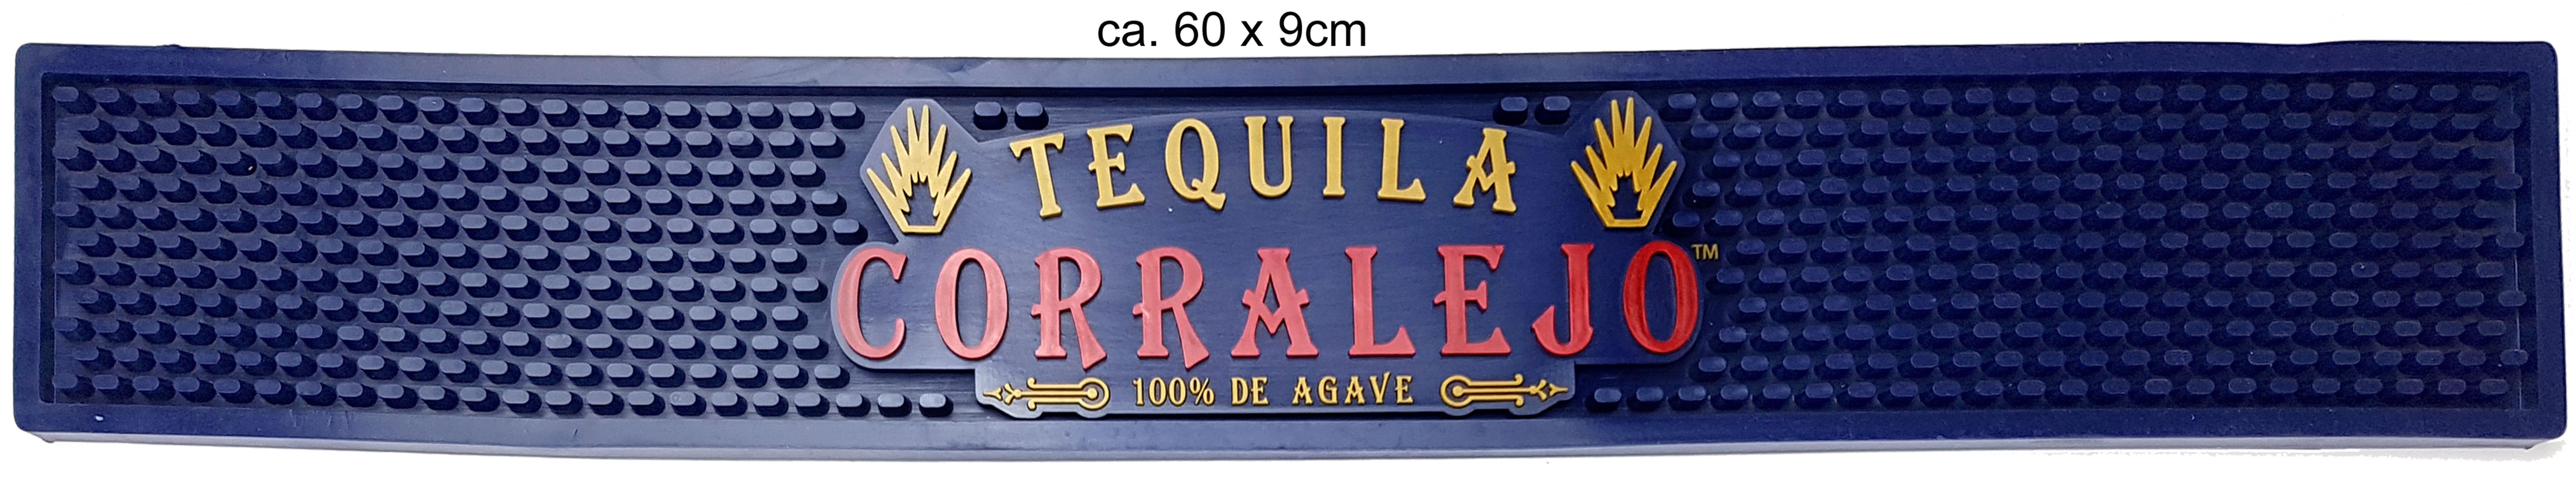 Corralejo Tequila Barmatte Gummimatte Bar - ca. 9 x 60cm